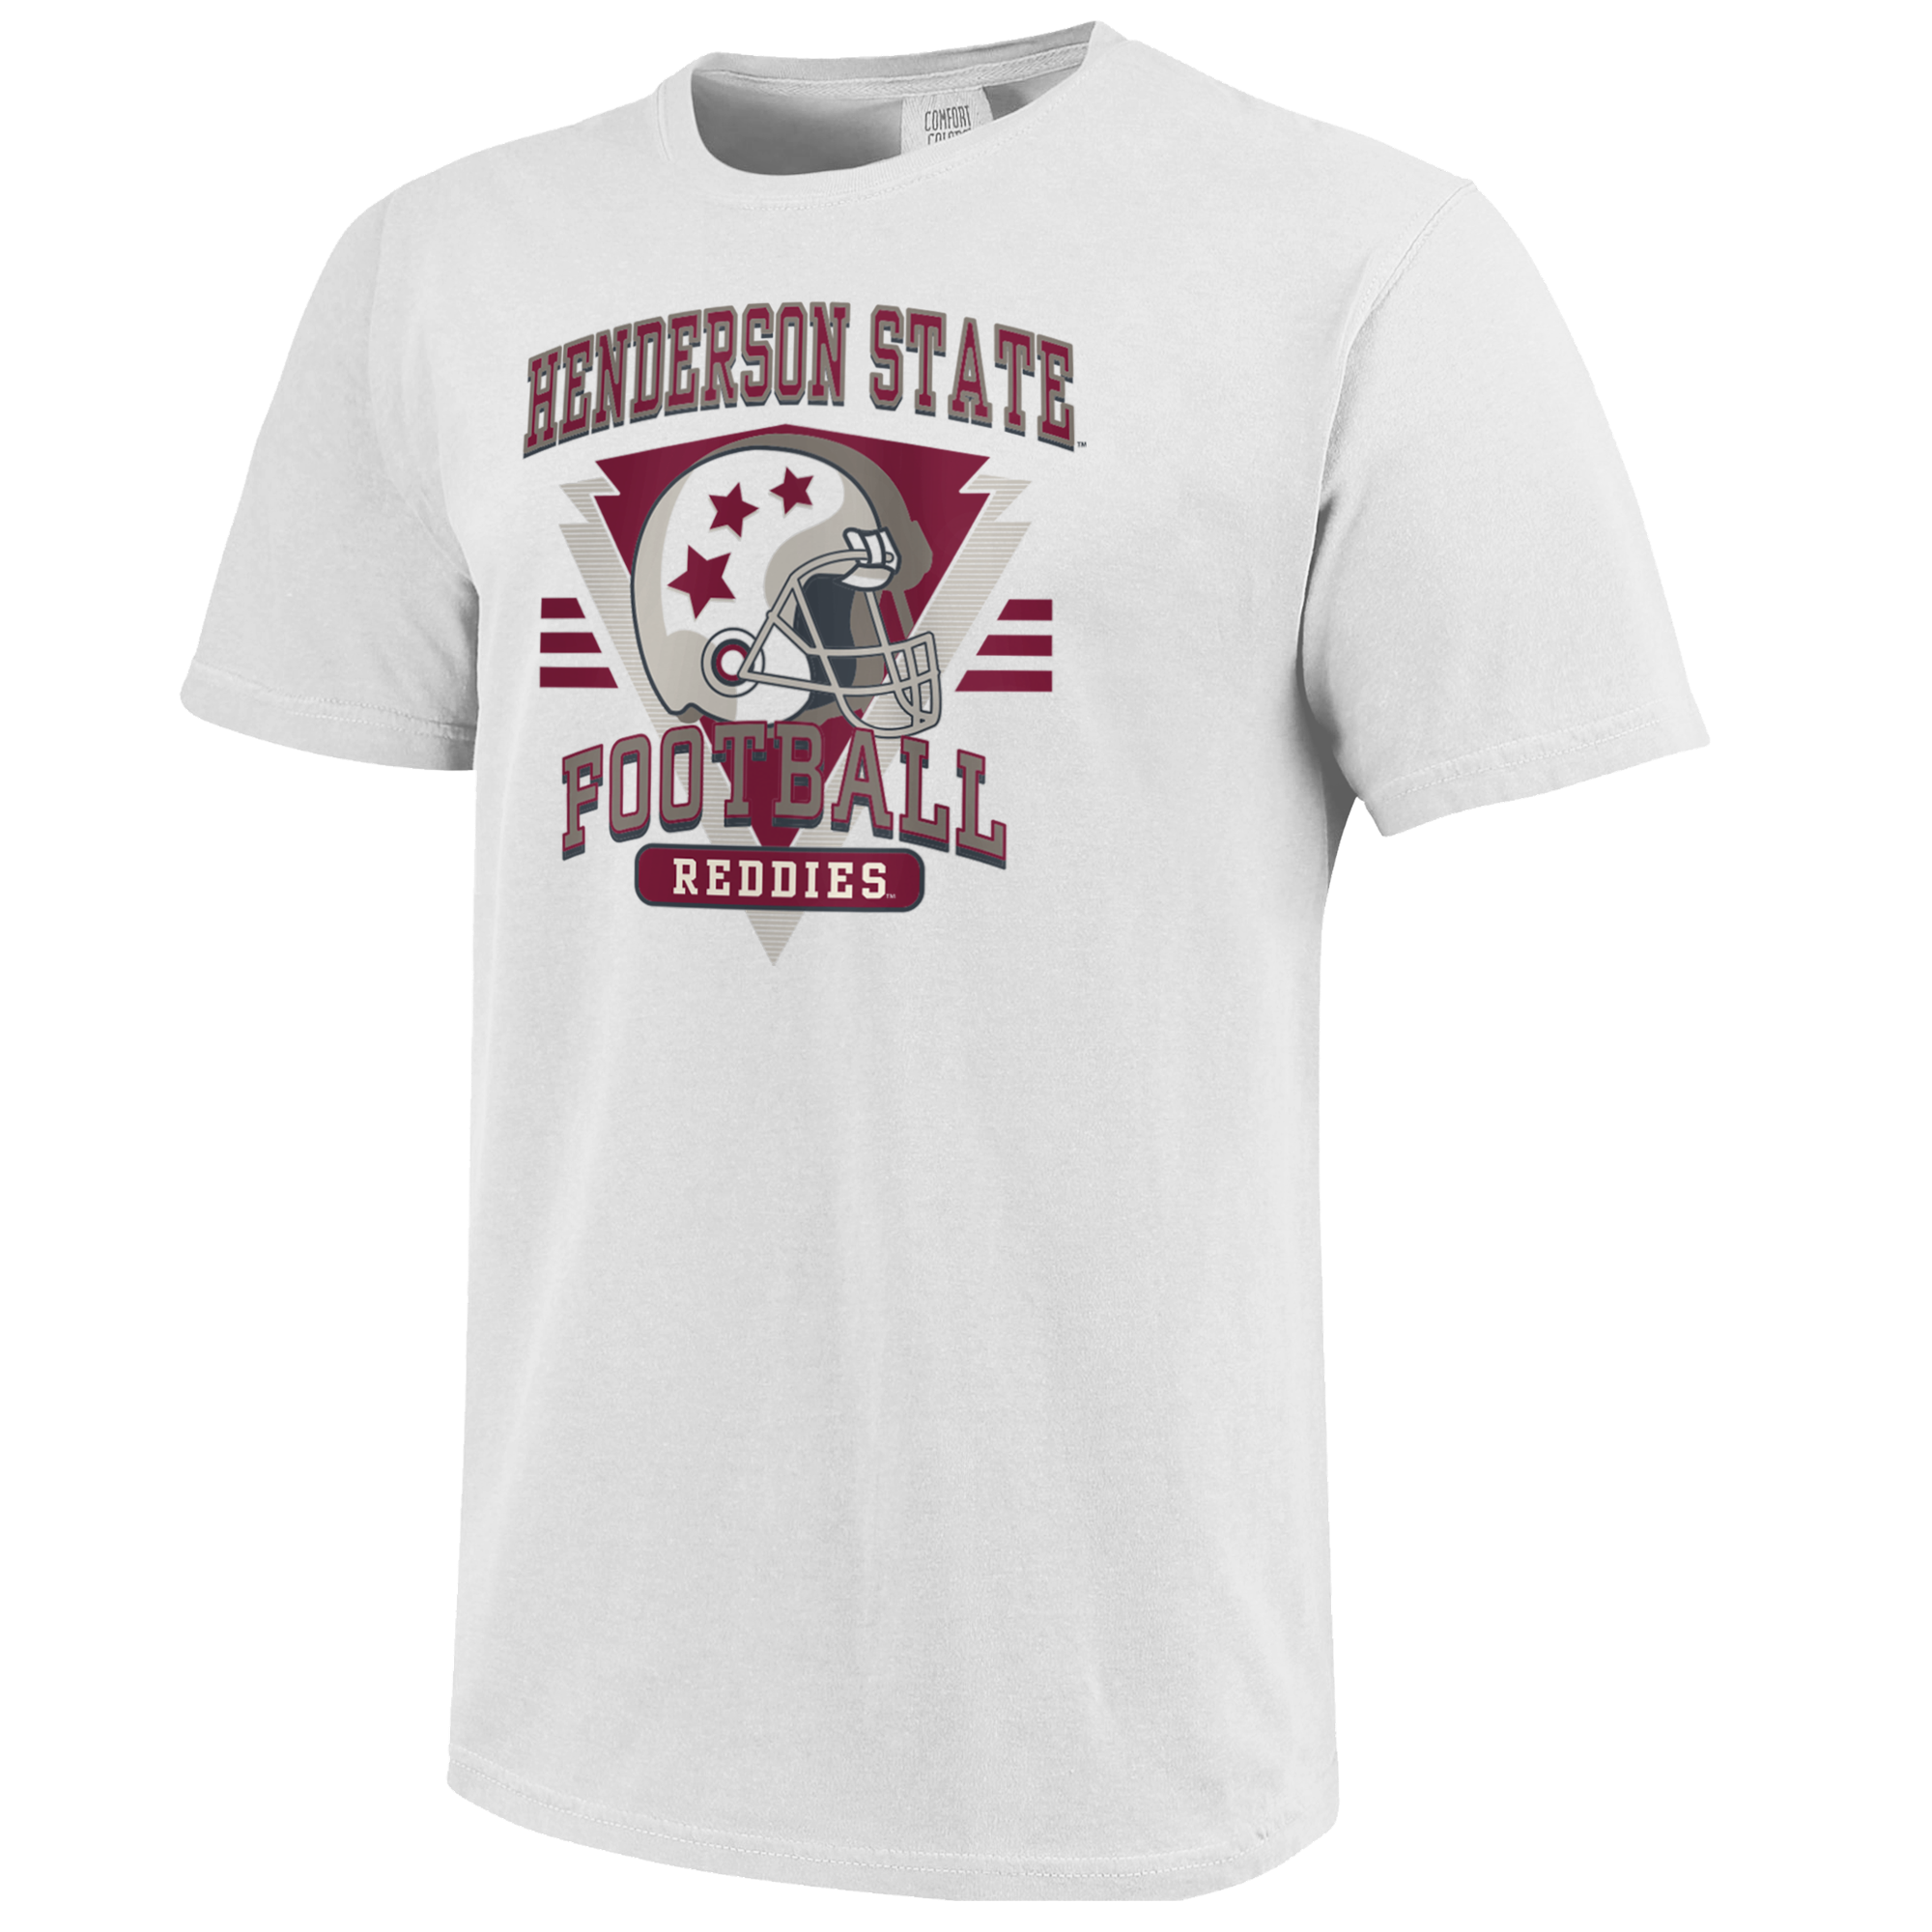 image of: Henderson State Football Retro Helmet Short Sleeve T-Shirt